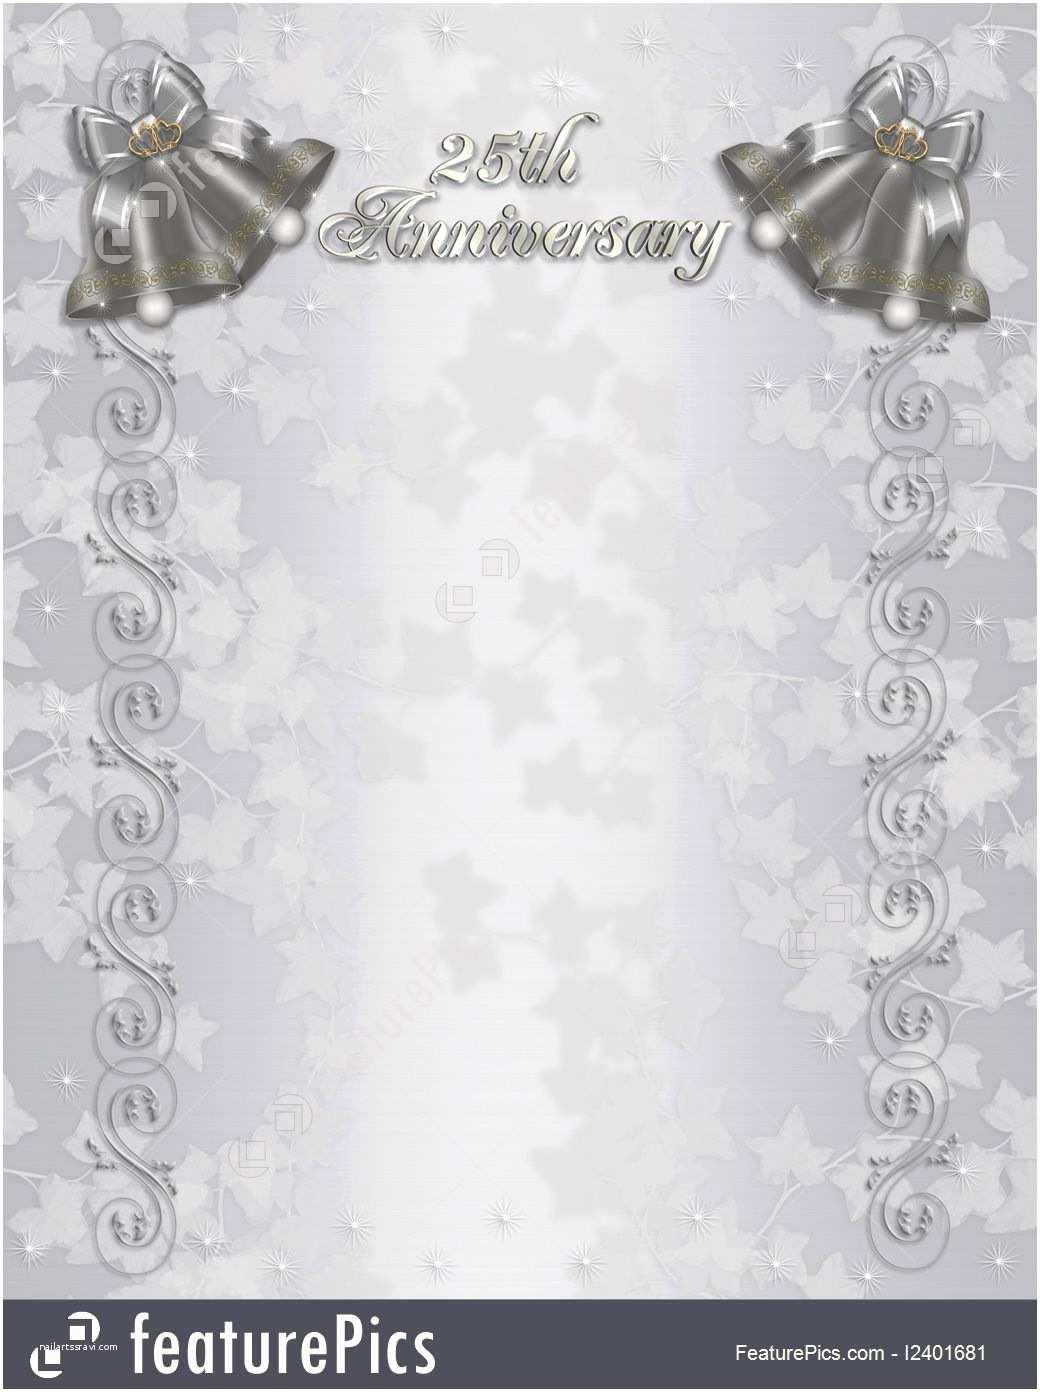 25th Wedding Anniversary Invitation Cards Free Download Free 25th Wedding Anniversary Invitations Free